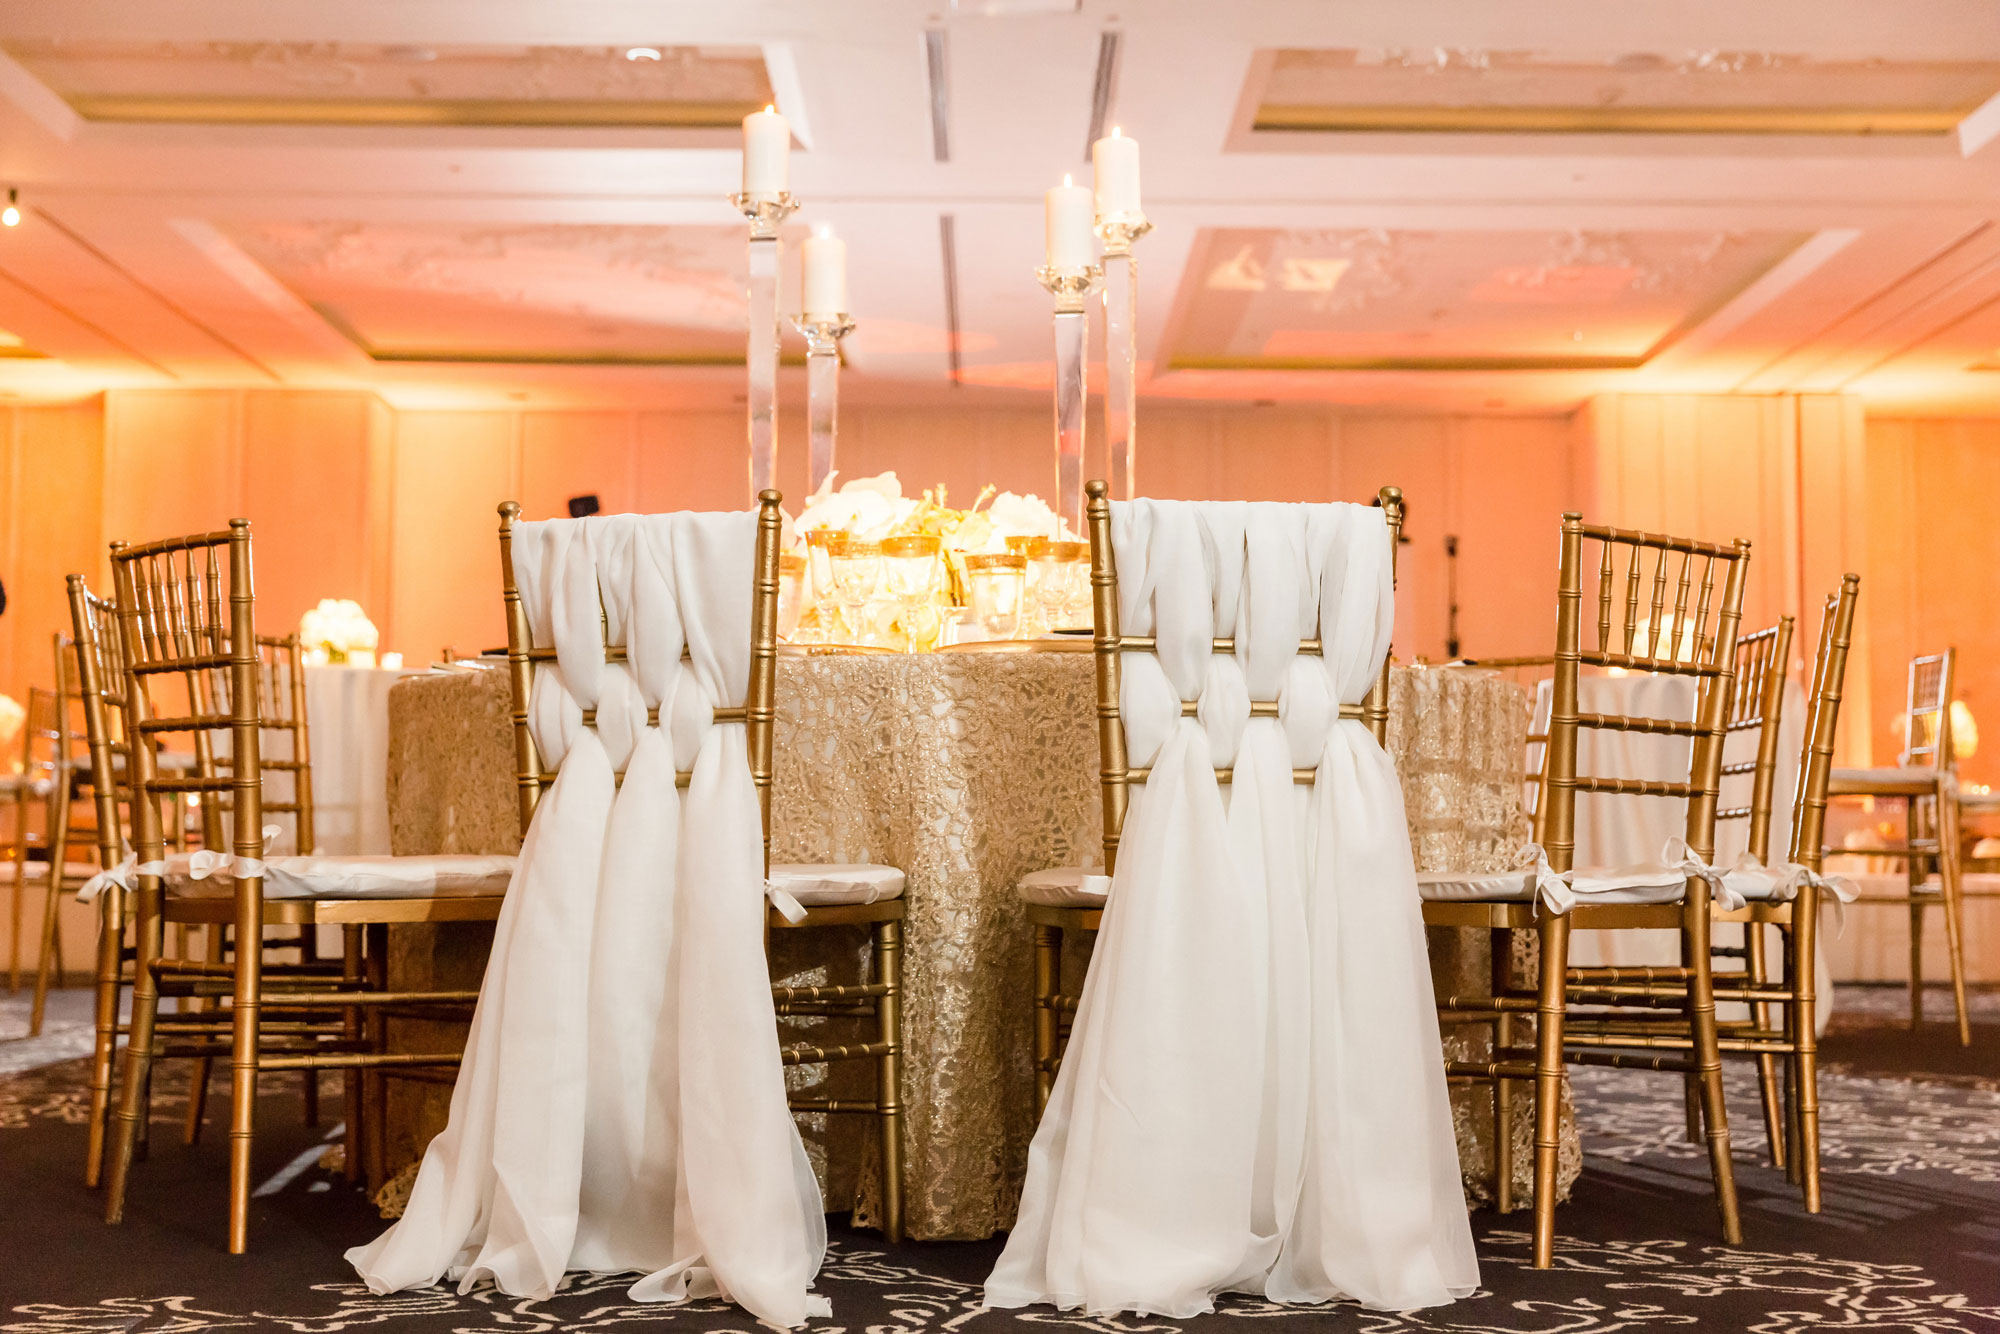 Inside Weddings Spring 2017 issue nuage designs linens weaved through chair back wedding reception